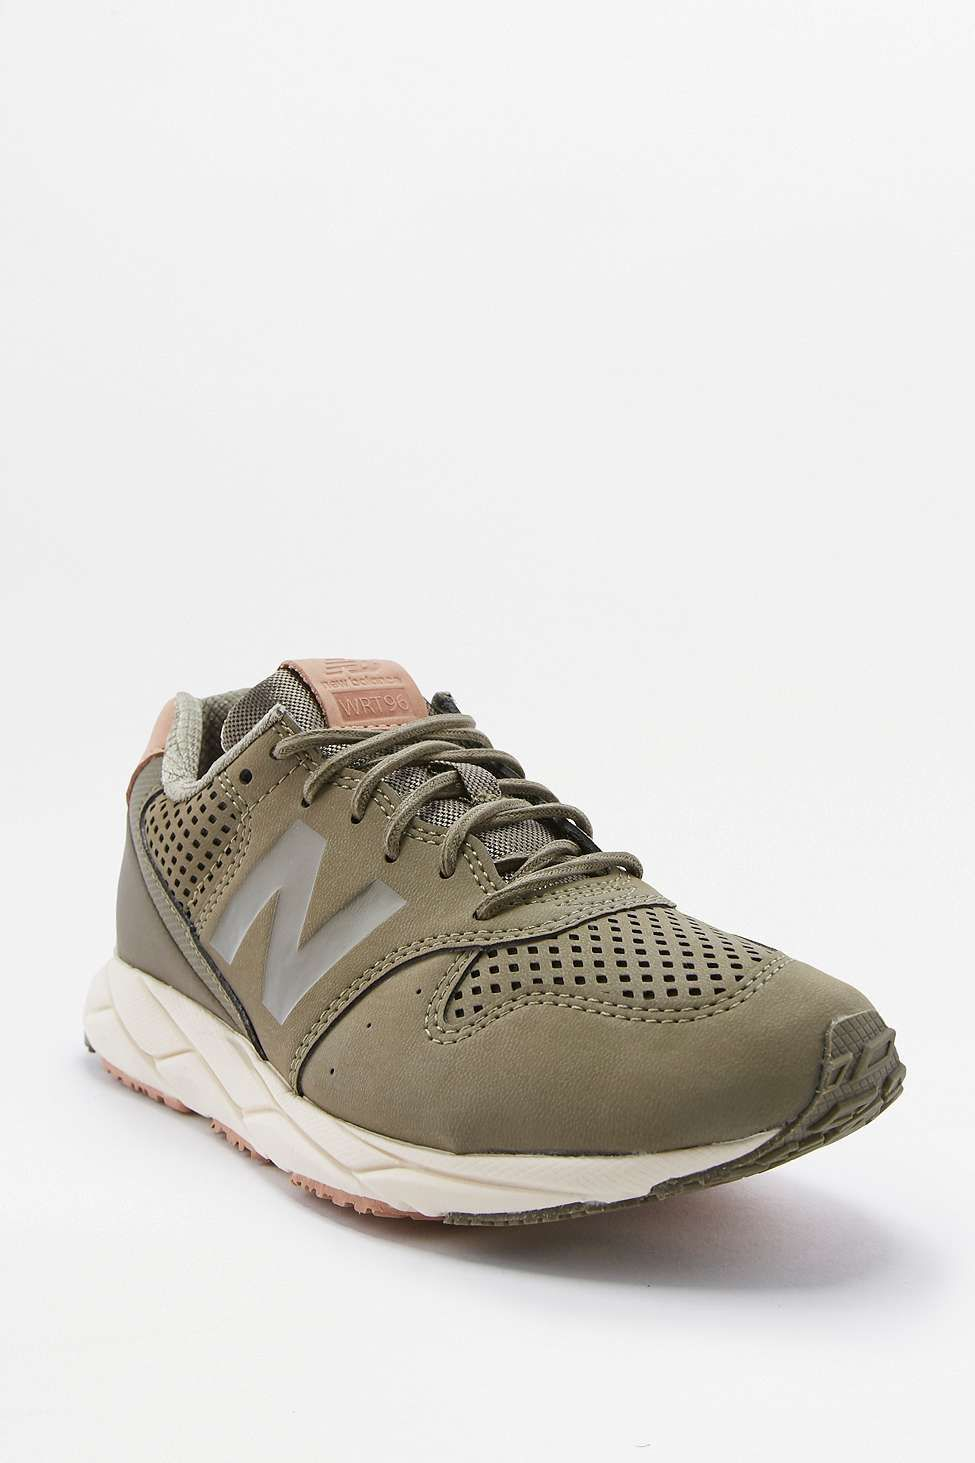 new balance 96 revlite khaki trainers